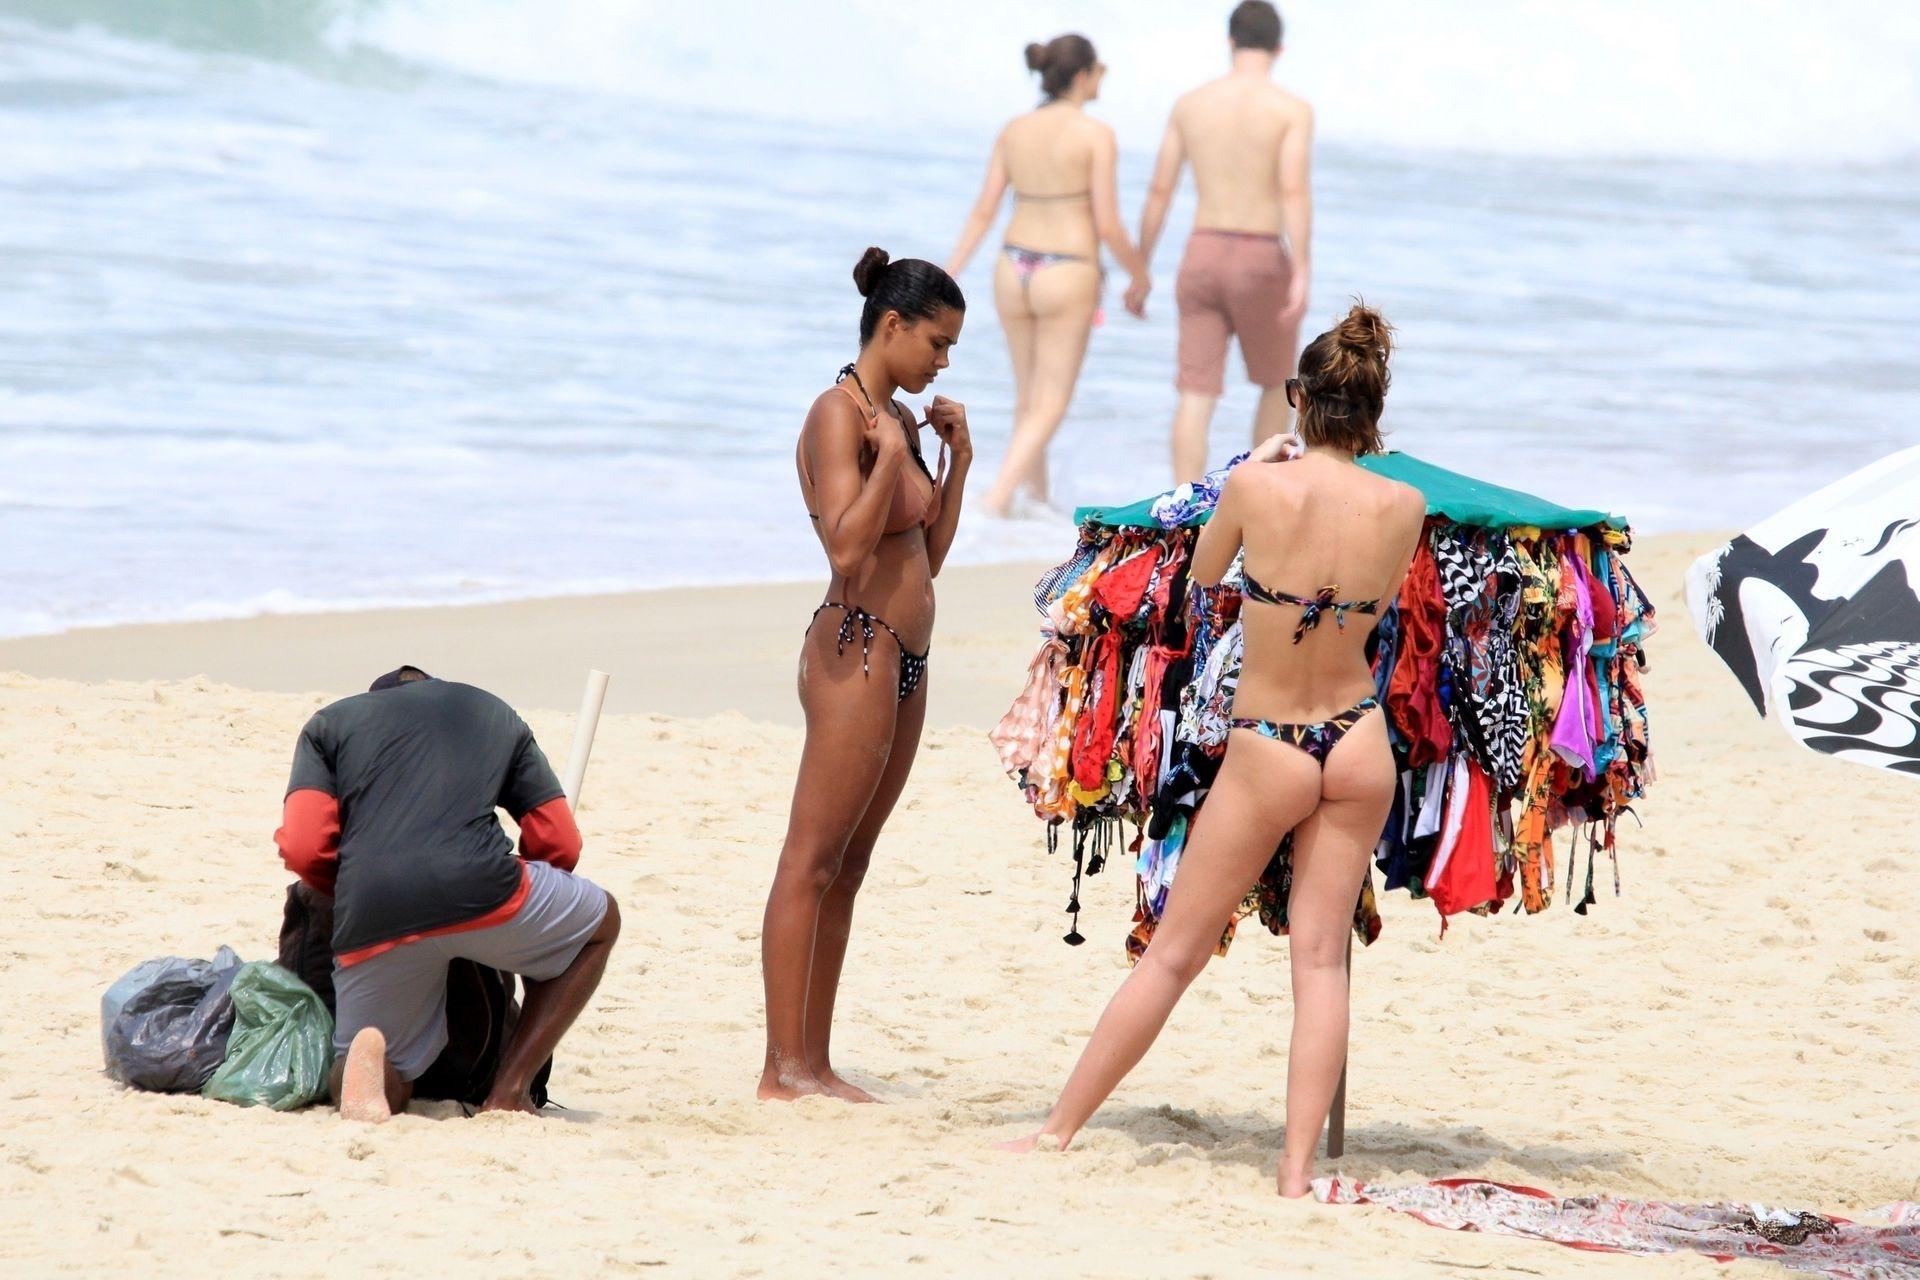 Tina Kunakey Nearly Nip Slip While Frolicking On The Beach In Rio 0062